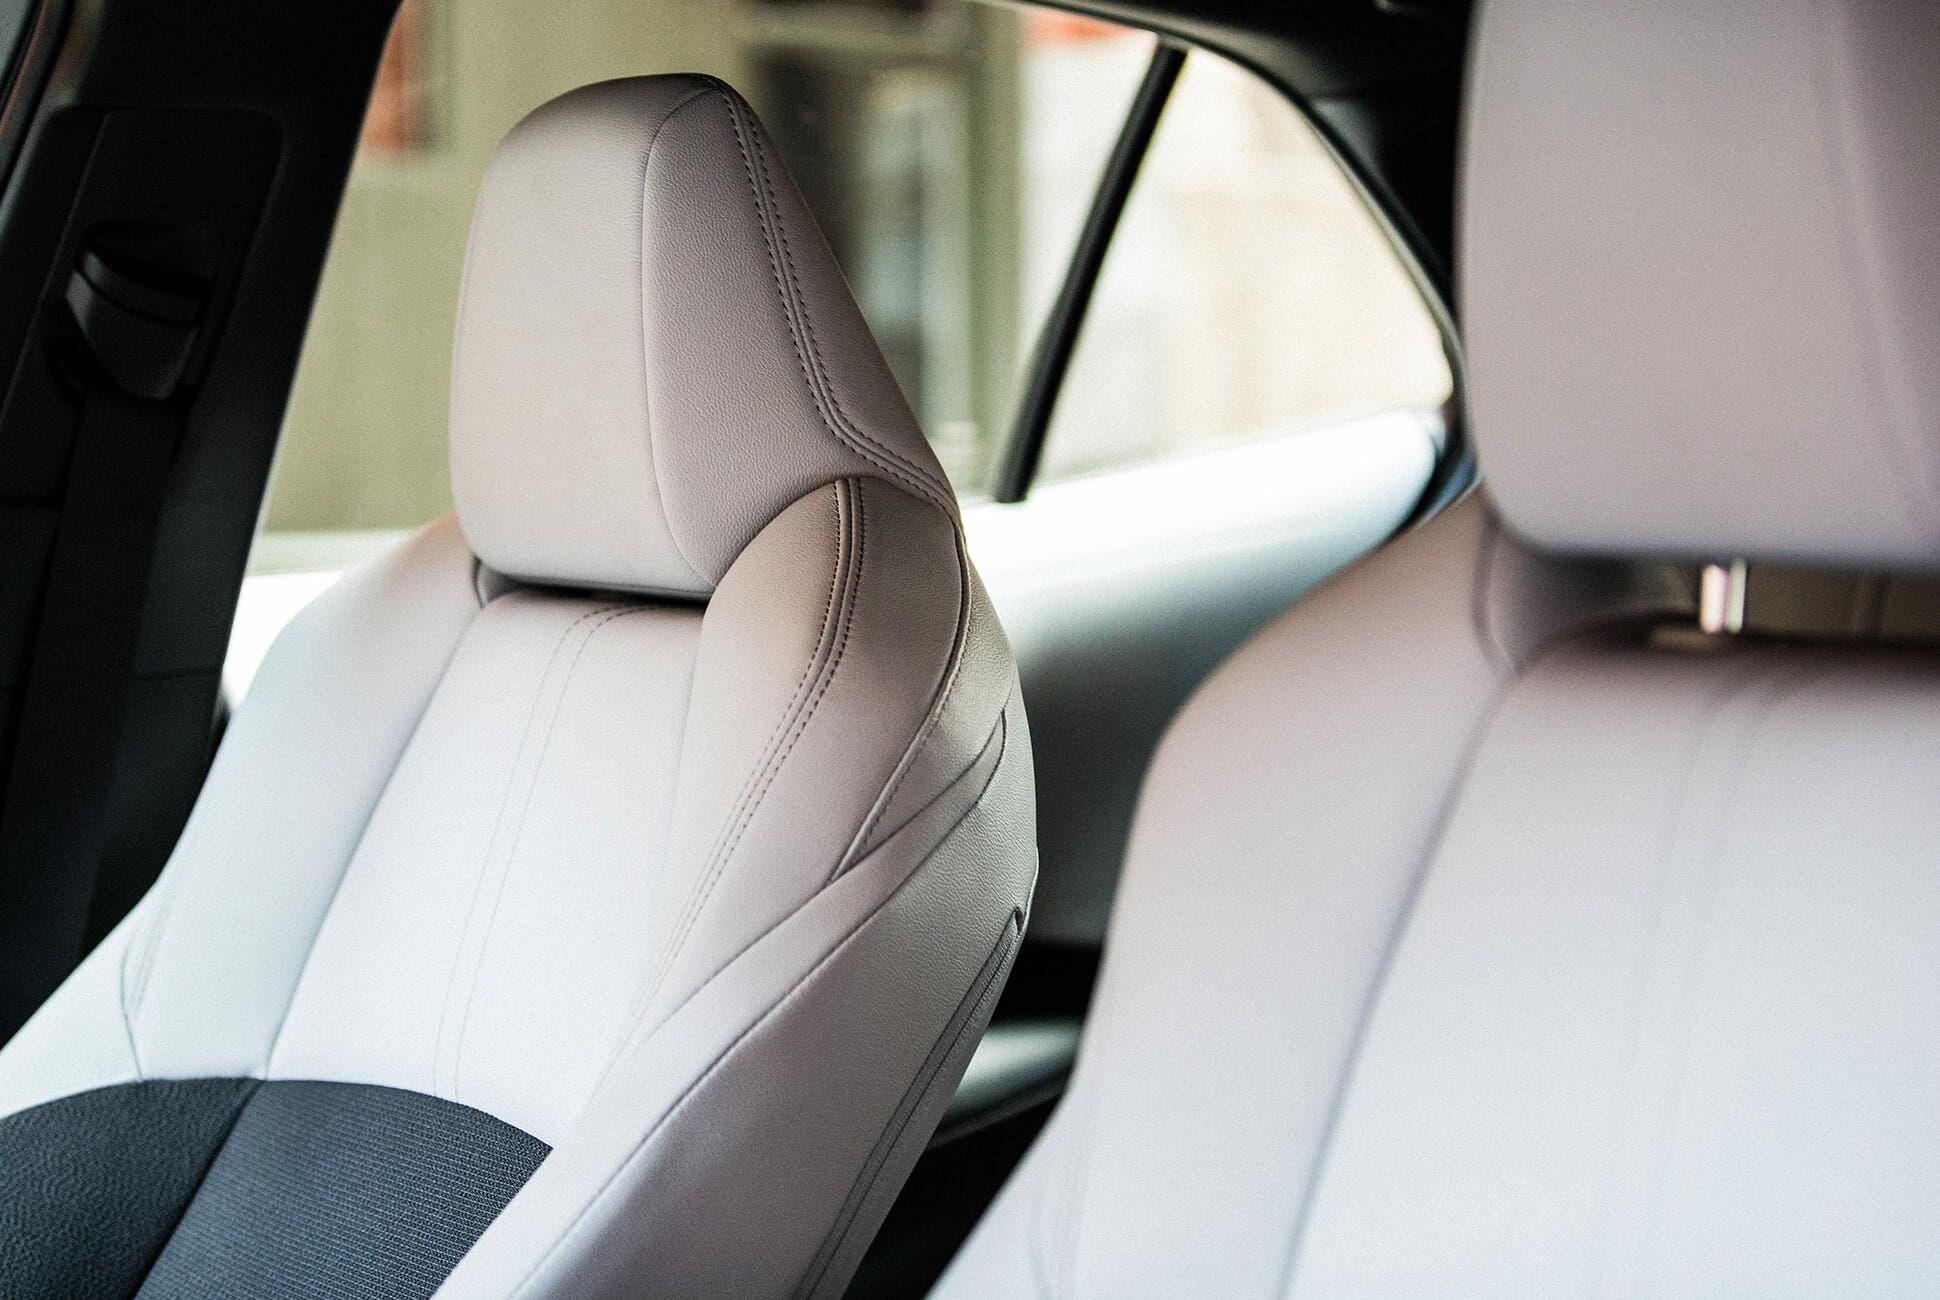 Toyota-Corolla-XSE-Hatch-Review-gear-patrol-slide-14